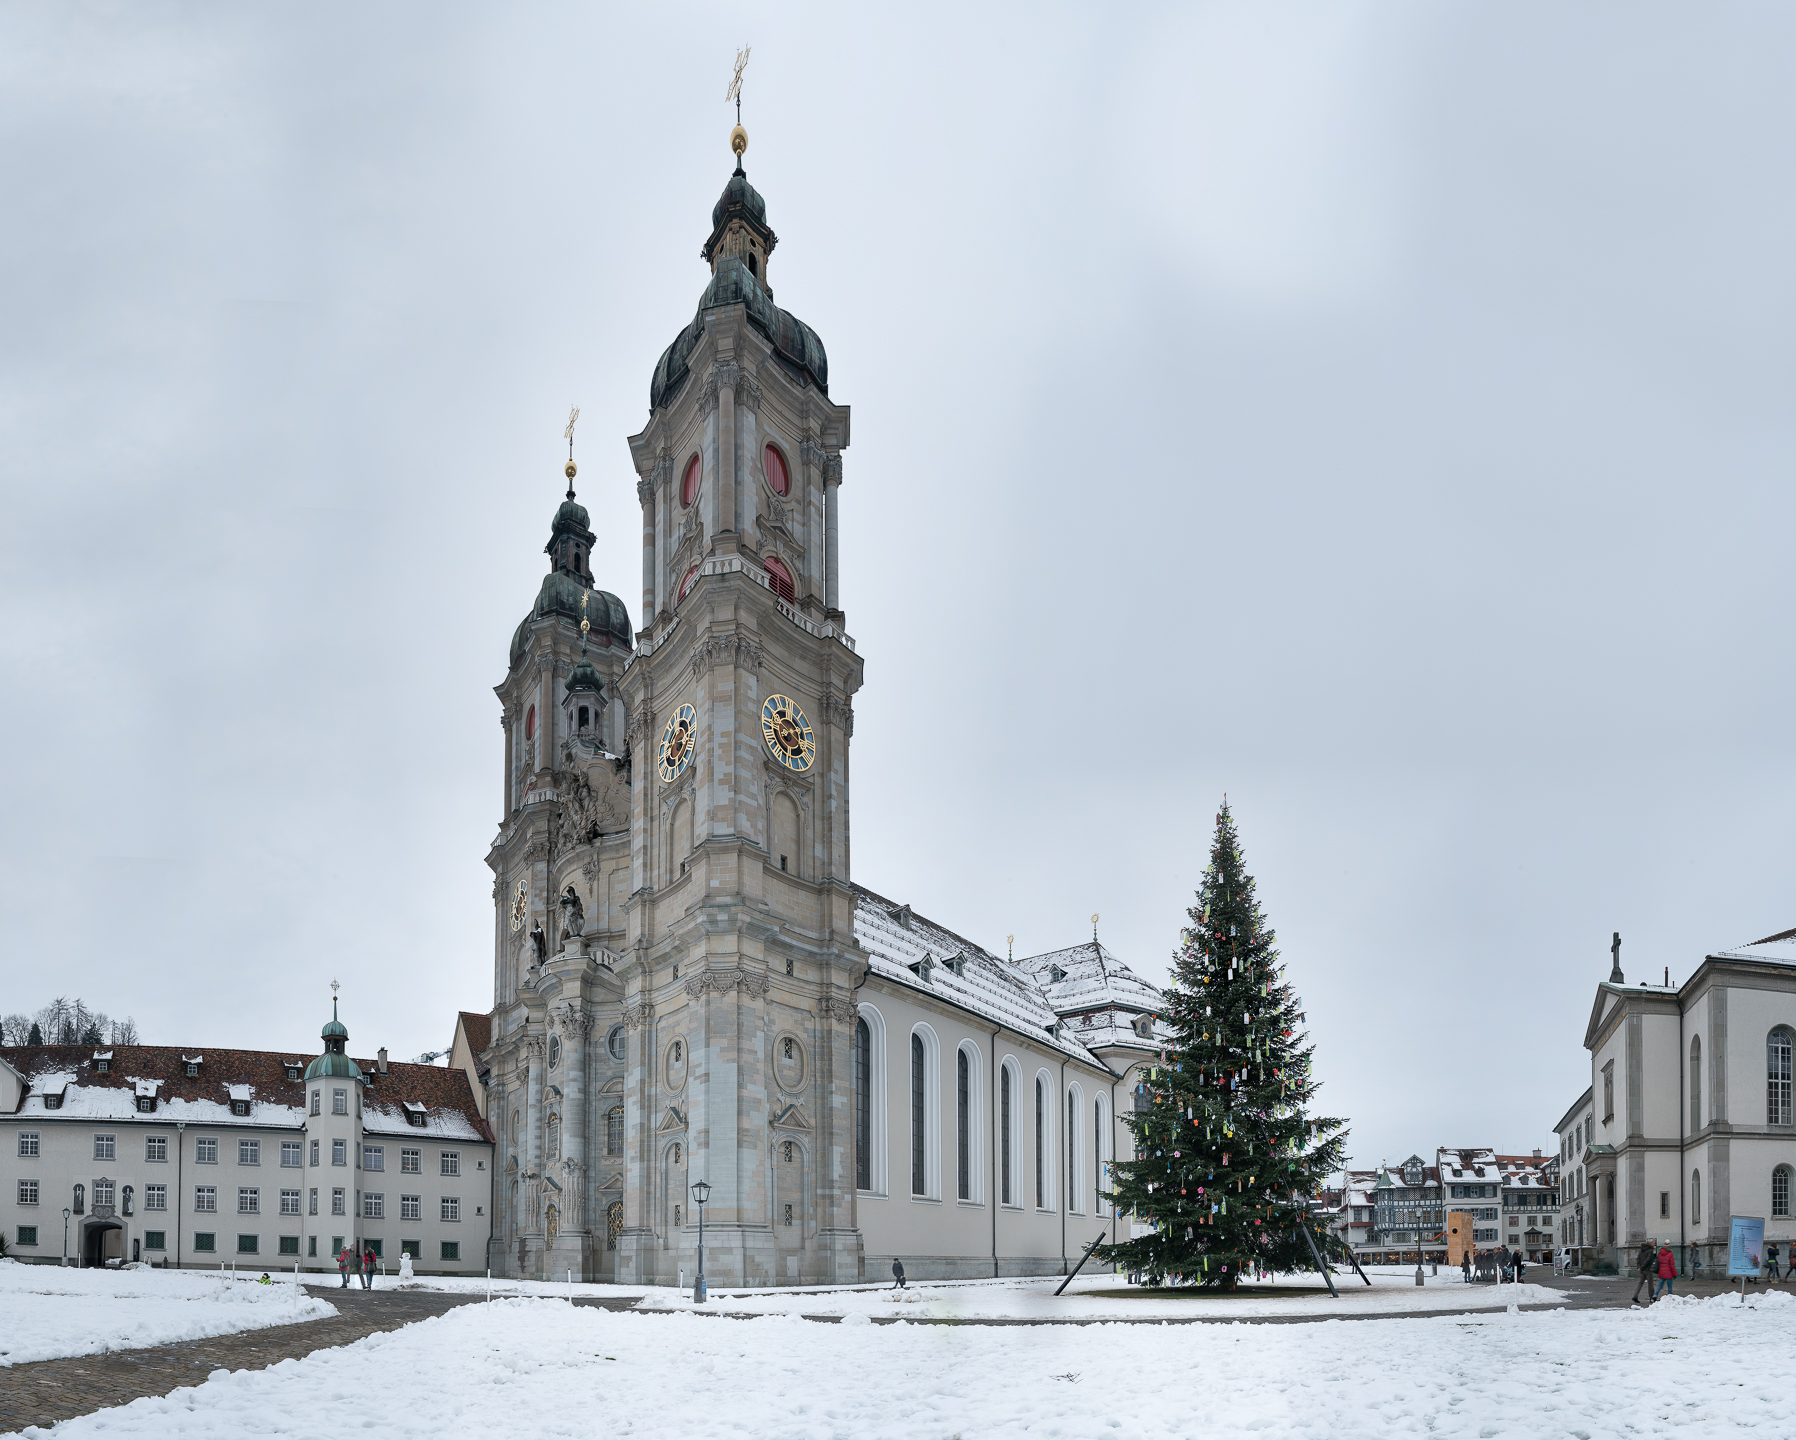 Quartierverein-Gallusplatz-Panorama-Dezember- 2017-2